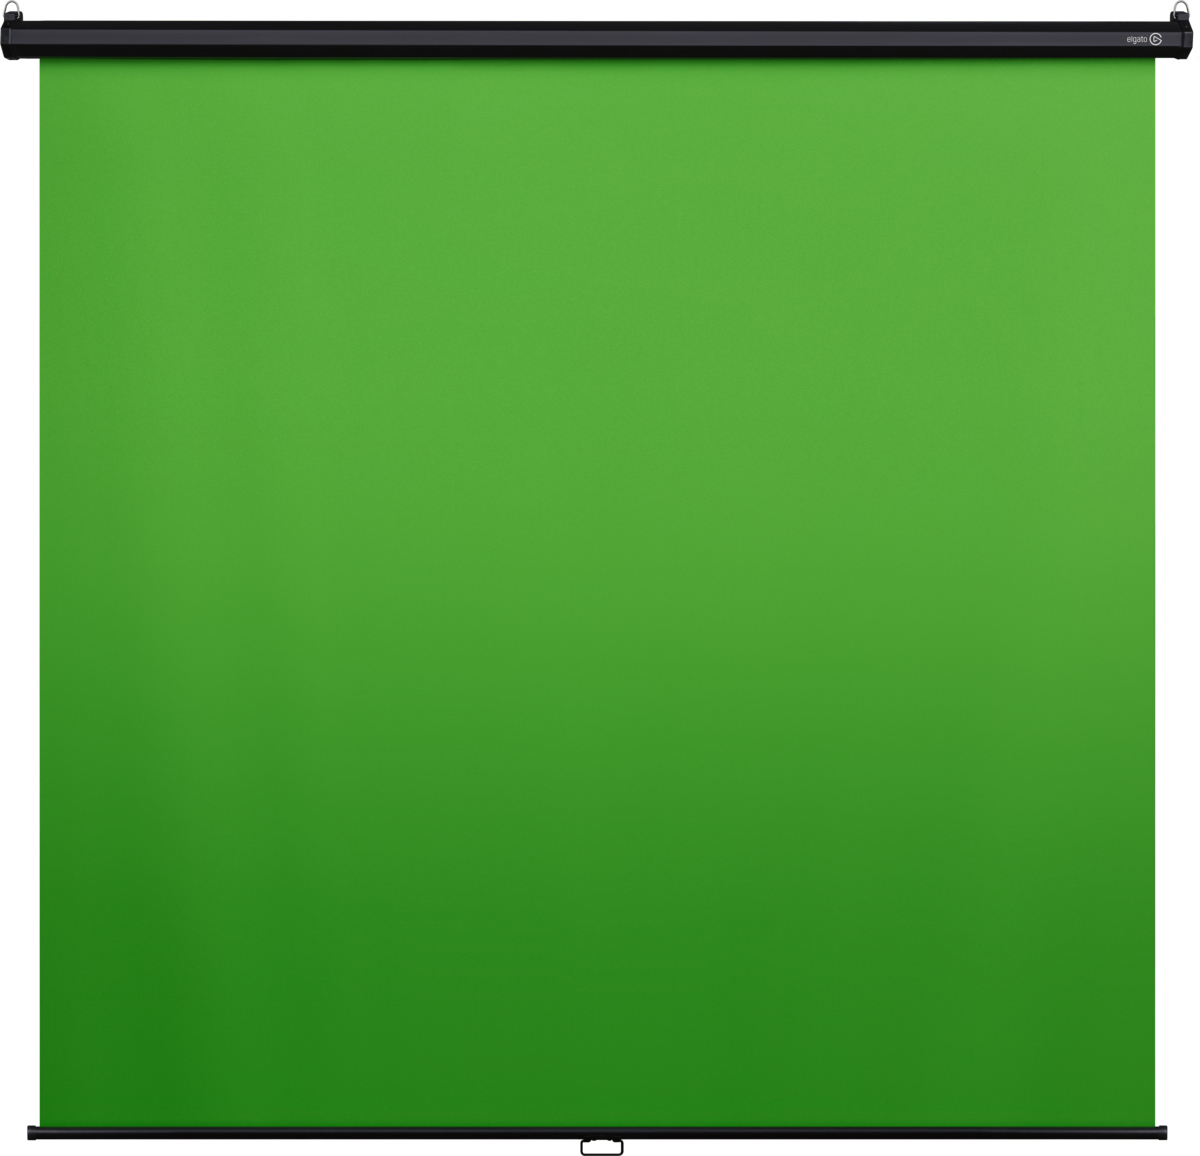 Хромакей Elgato Green Screen MT